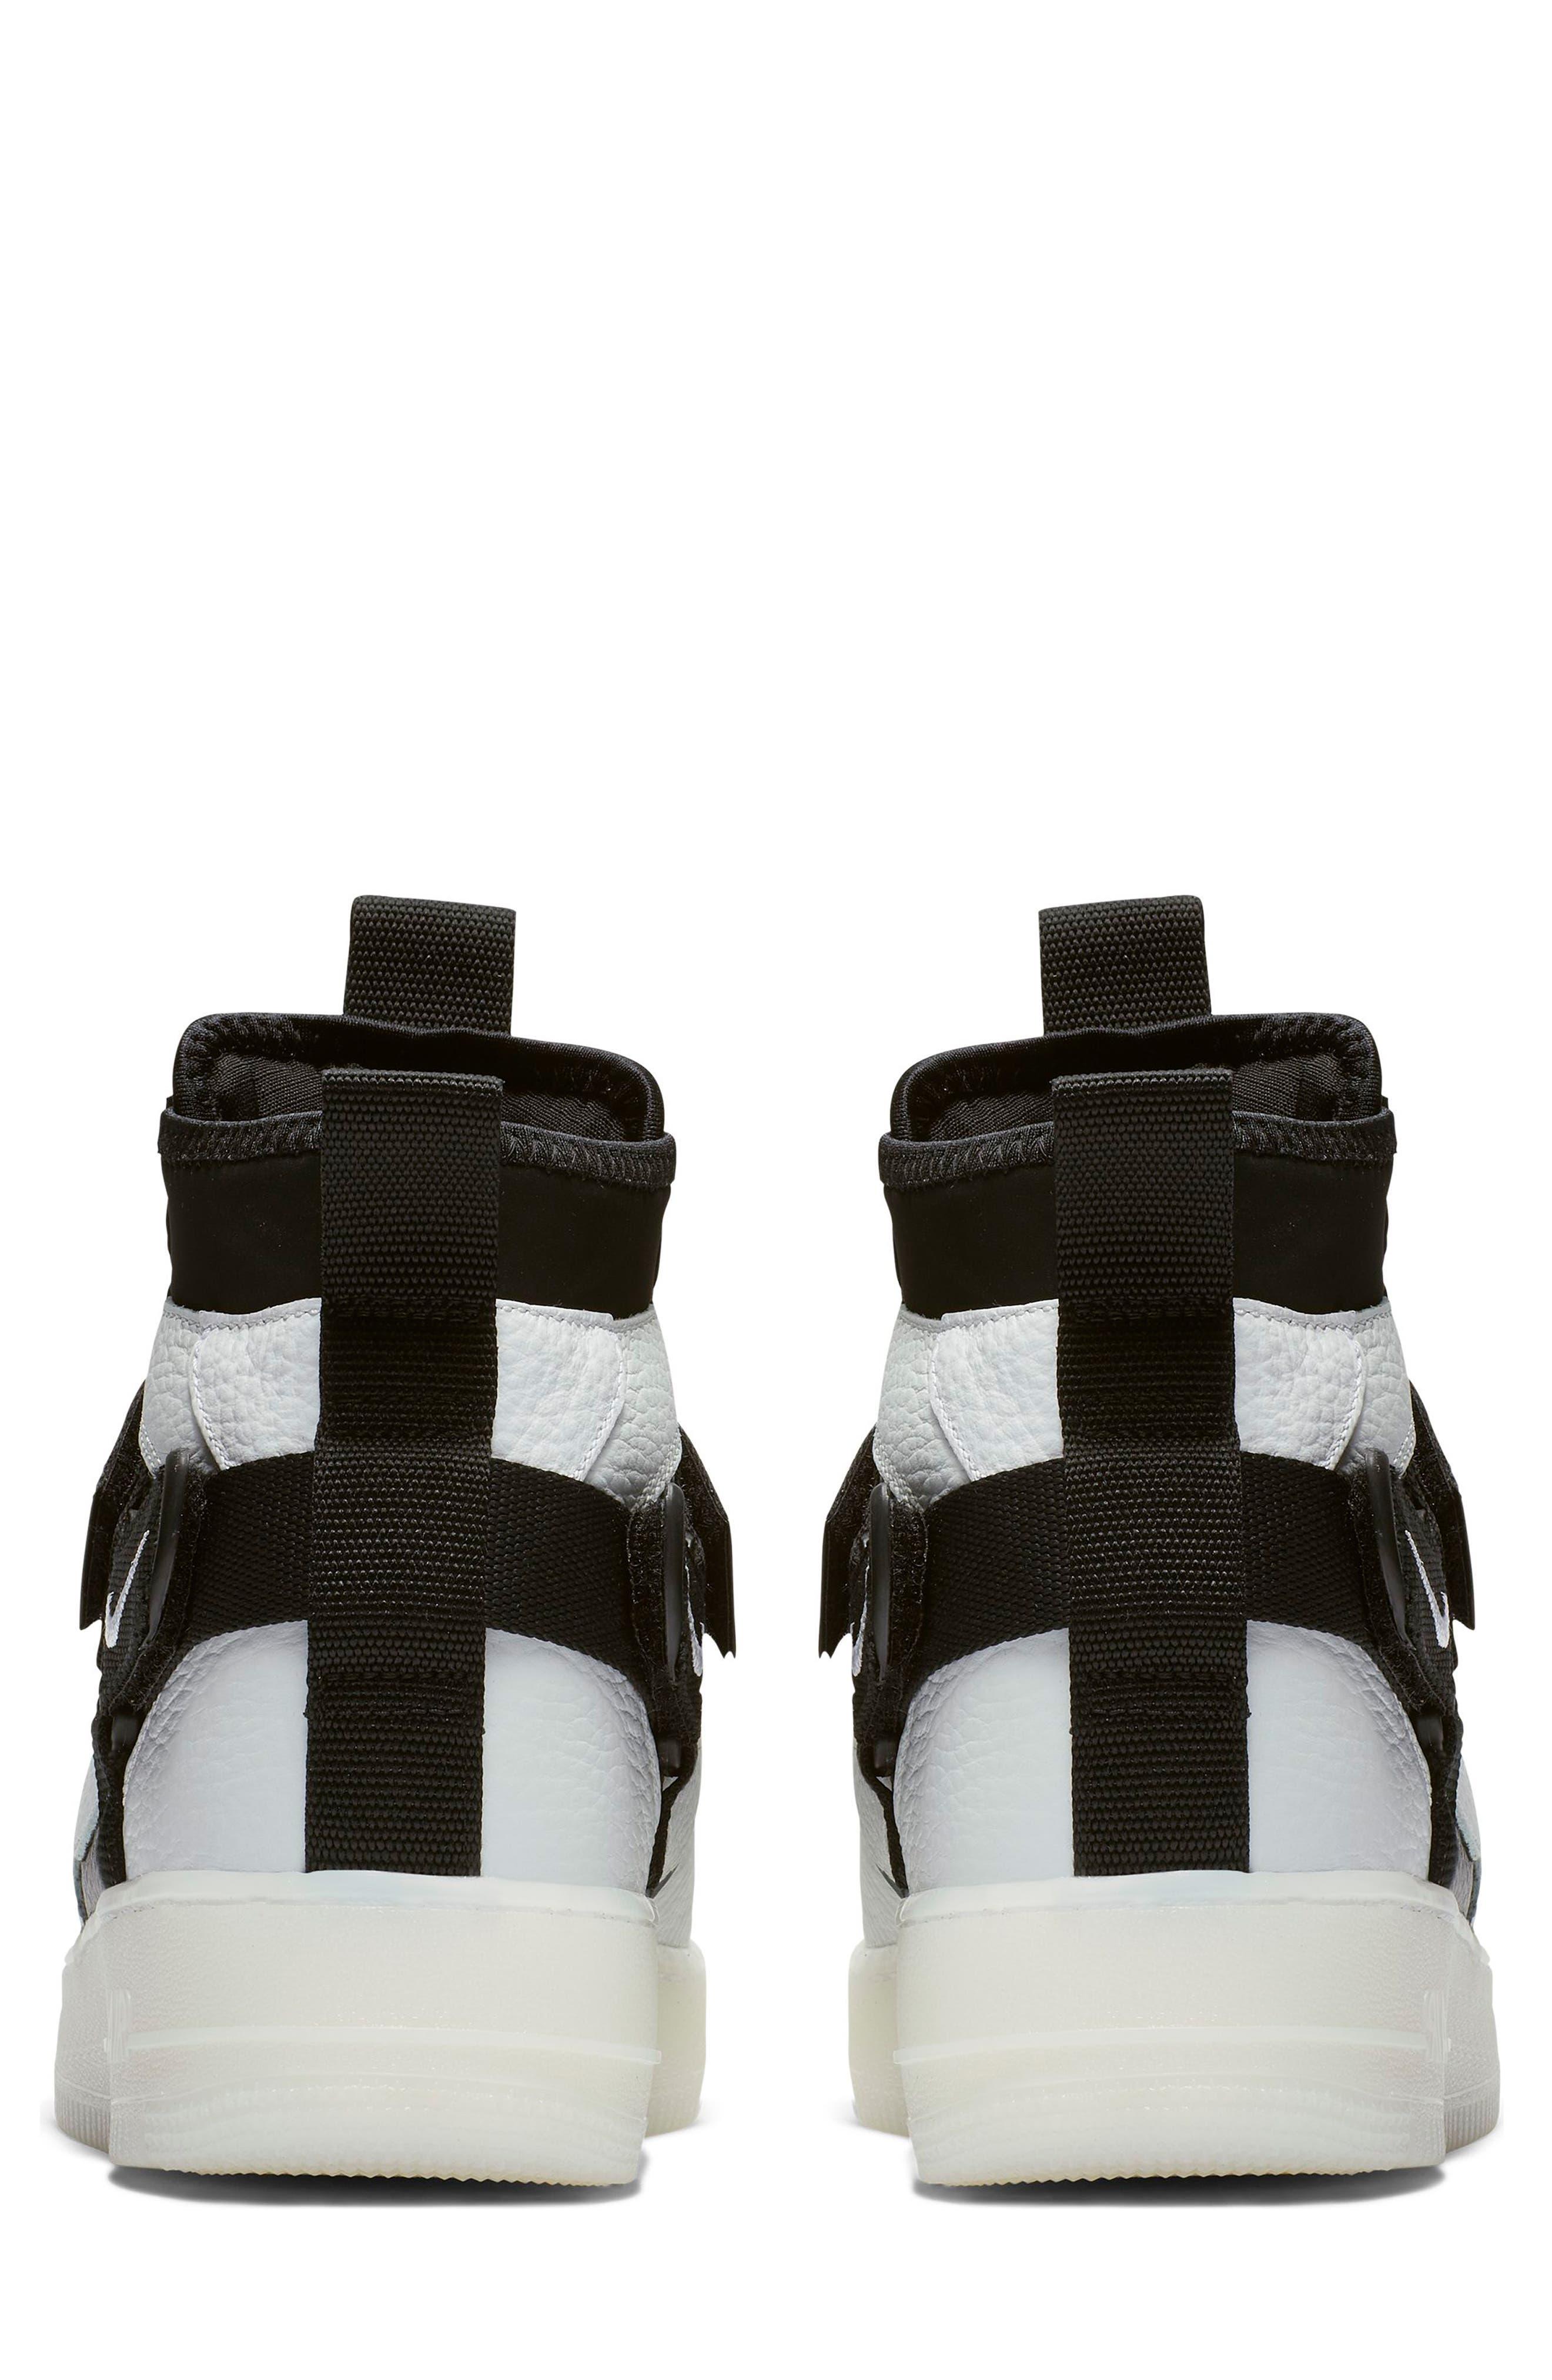 NIKE, Air Force 1 Utility Mid Sneaker, Alternate thumbnail 2, color, OFF WHITE/ BLACK/ WHITE